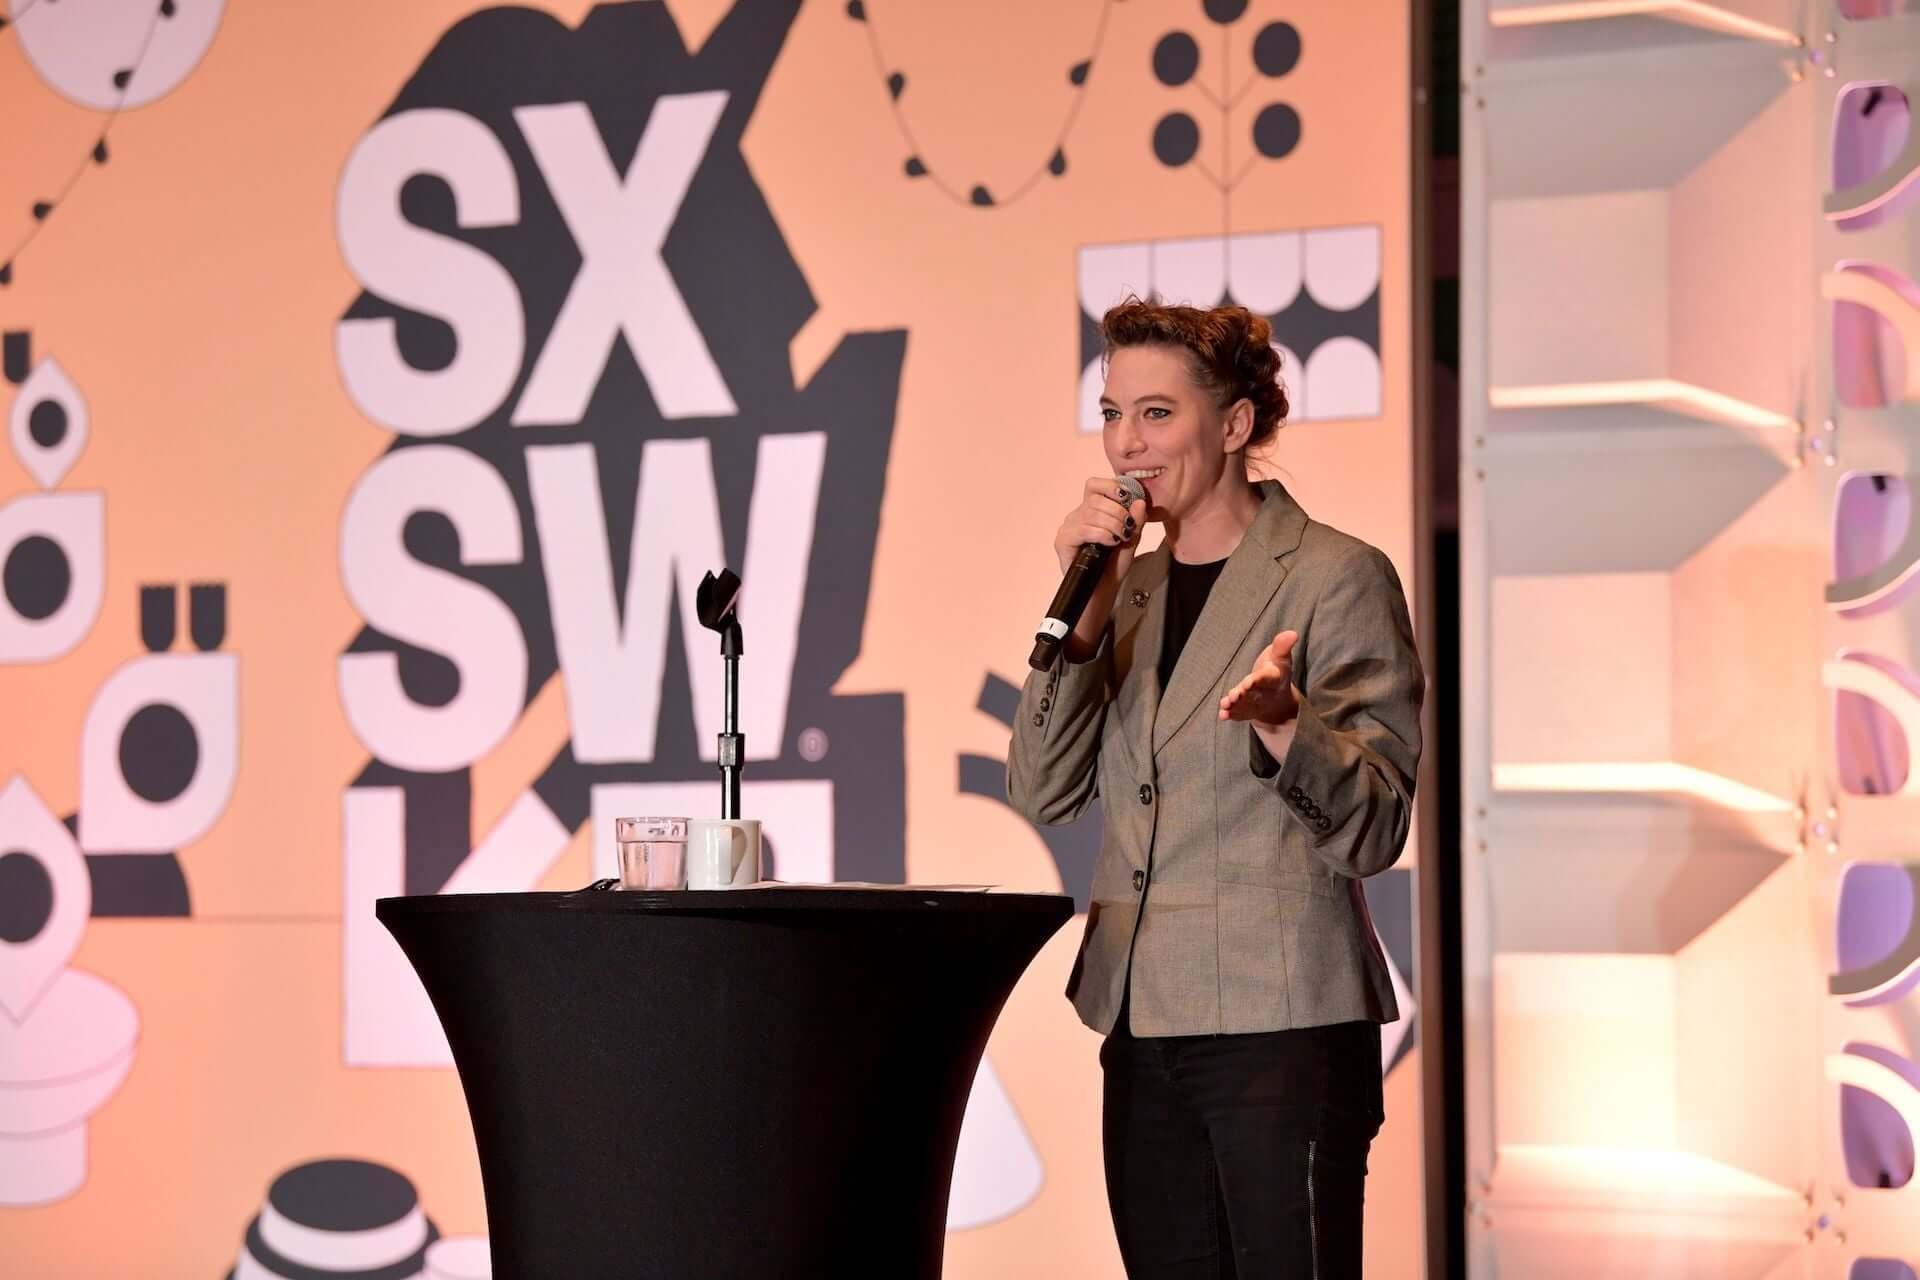 <SXSW 2021>がオンラインで開催決定!映画祭とカンファレンスセッションの一般公募もスタート art201007_sxsw-online_3-1920x1280